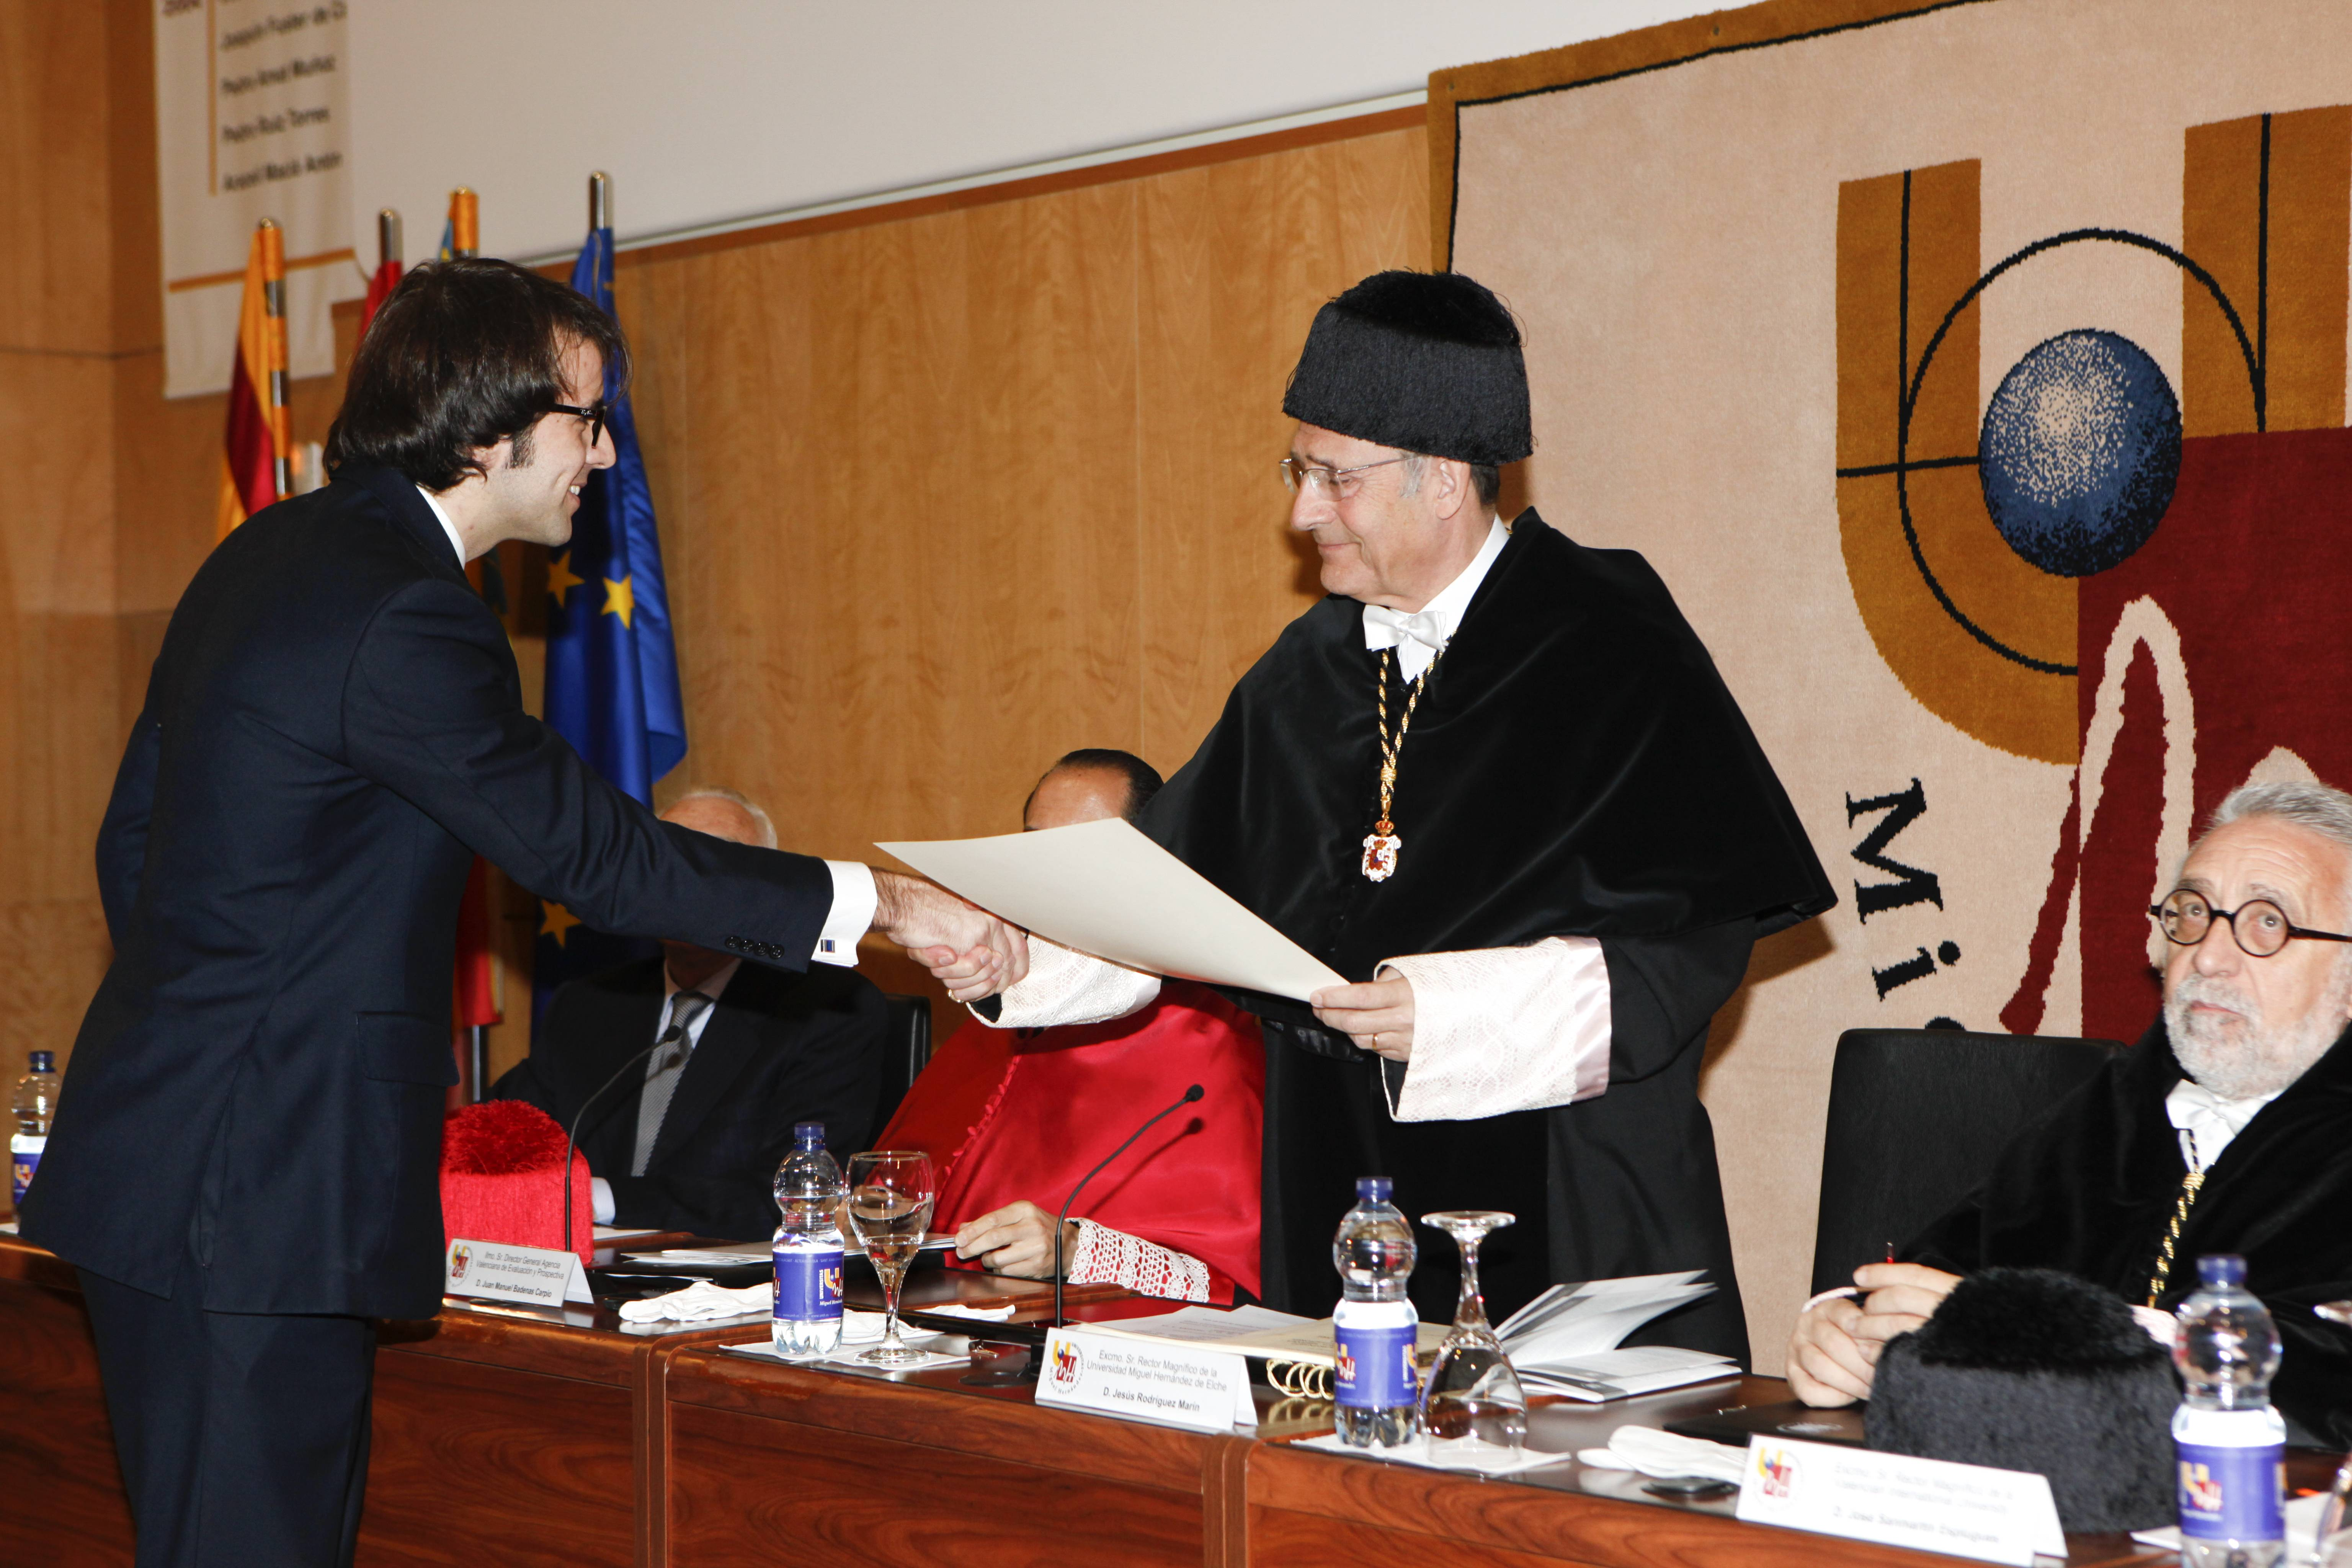 doctor-honoris-causa-luis-gamir_mg_0897.jpg